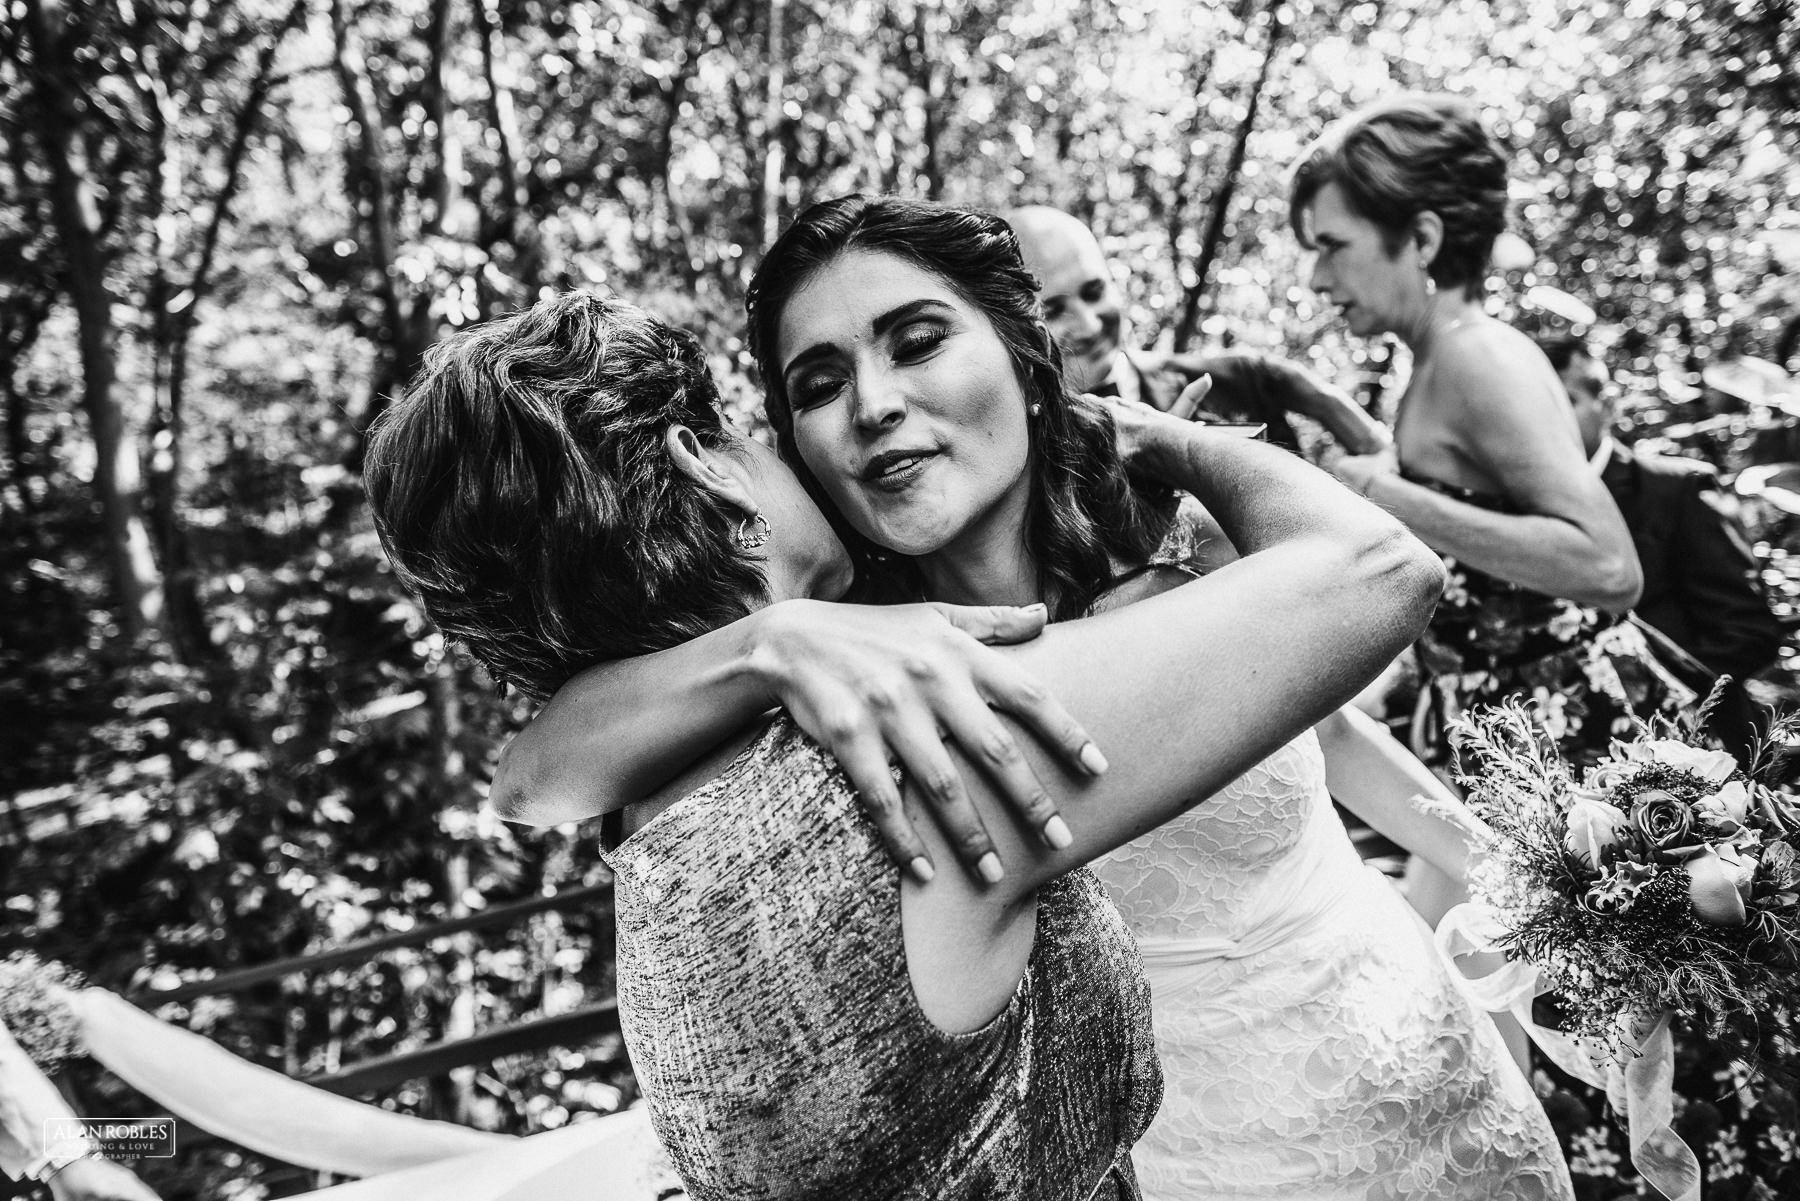 Fotografo de bodas guadalajara Alan Robles - Pinare terraza bistro 42